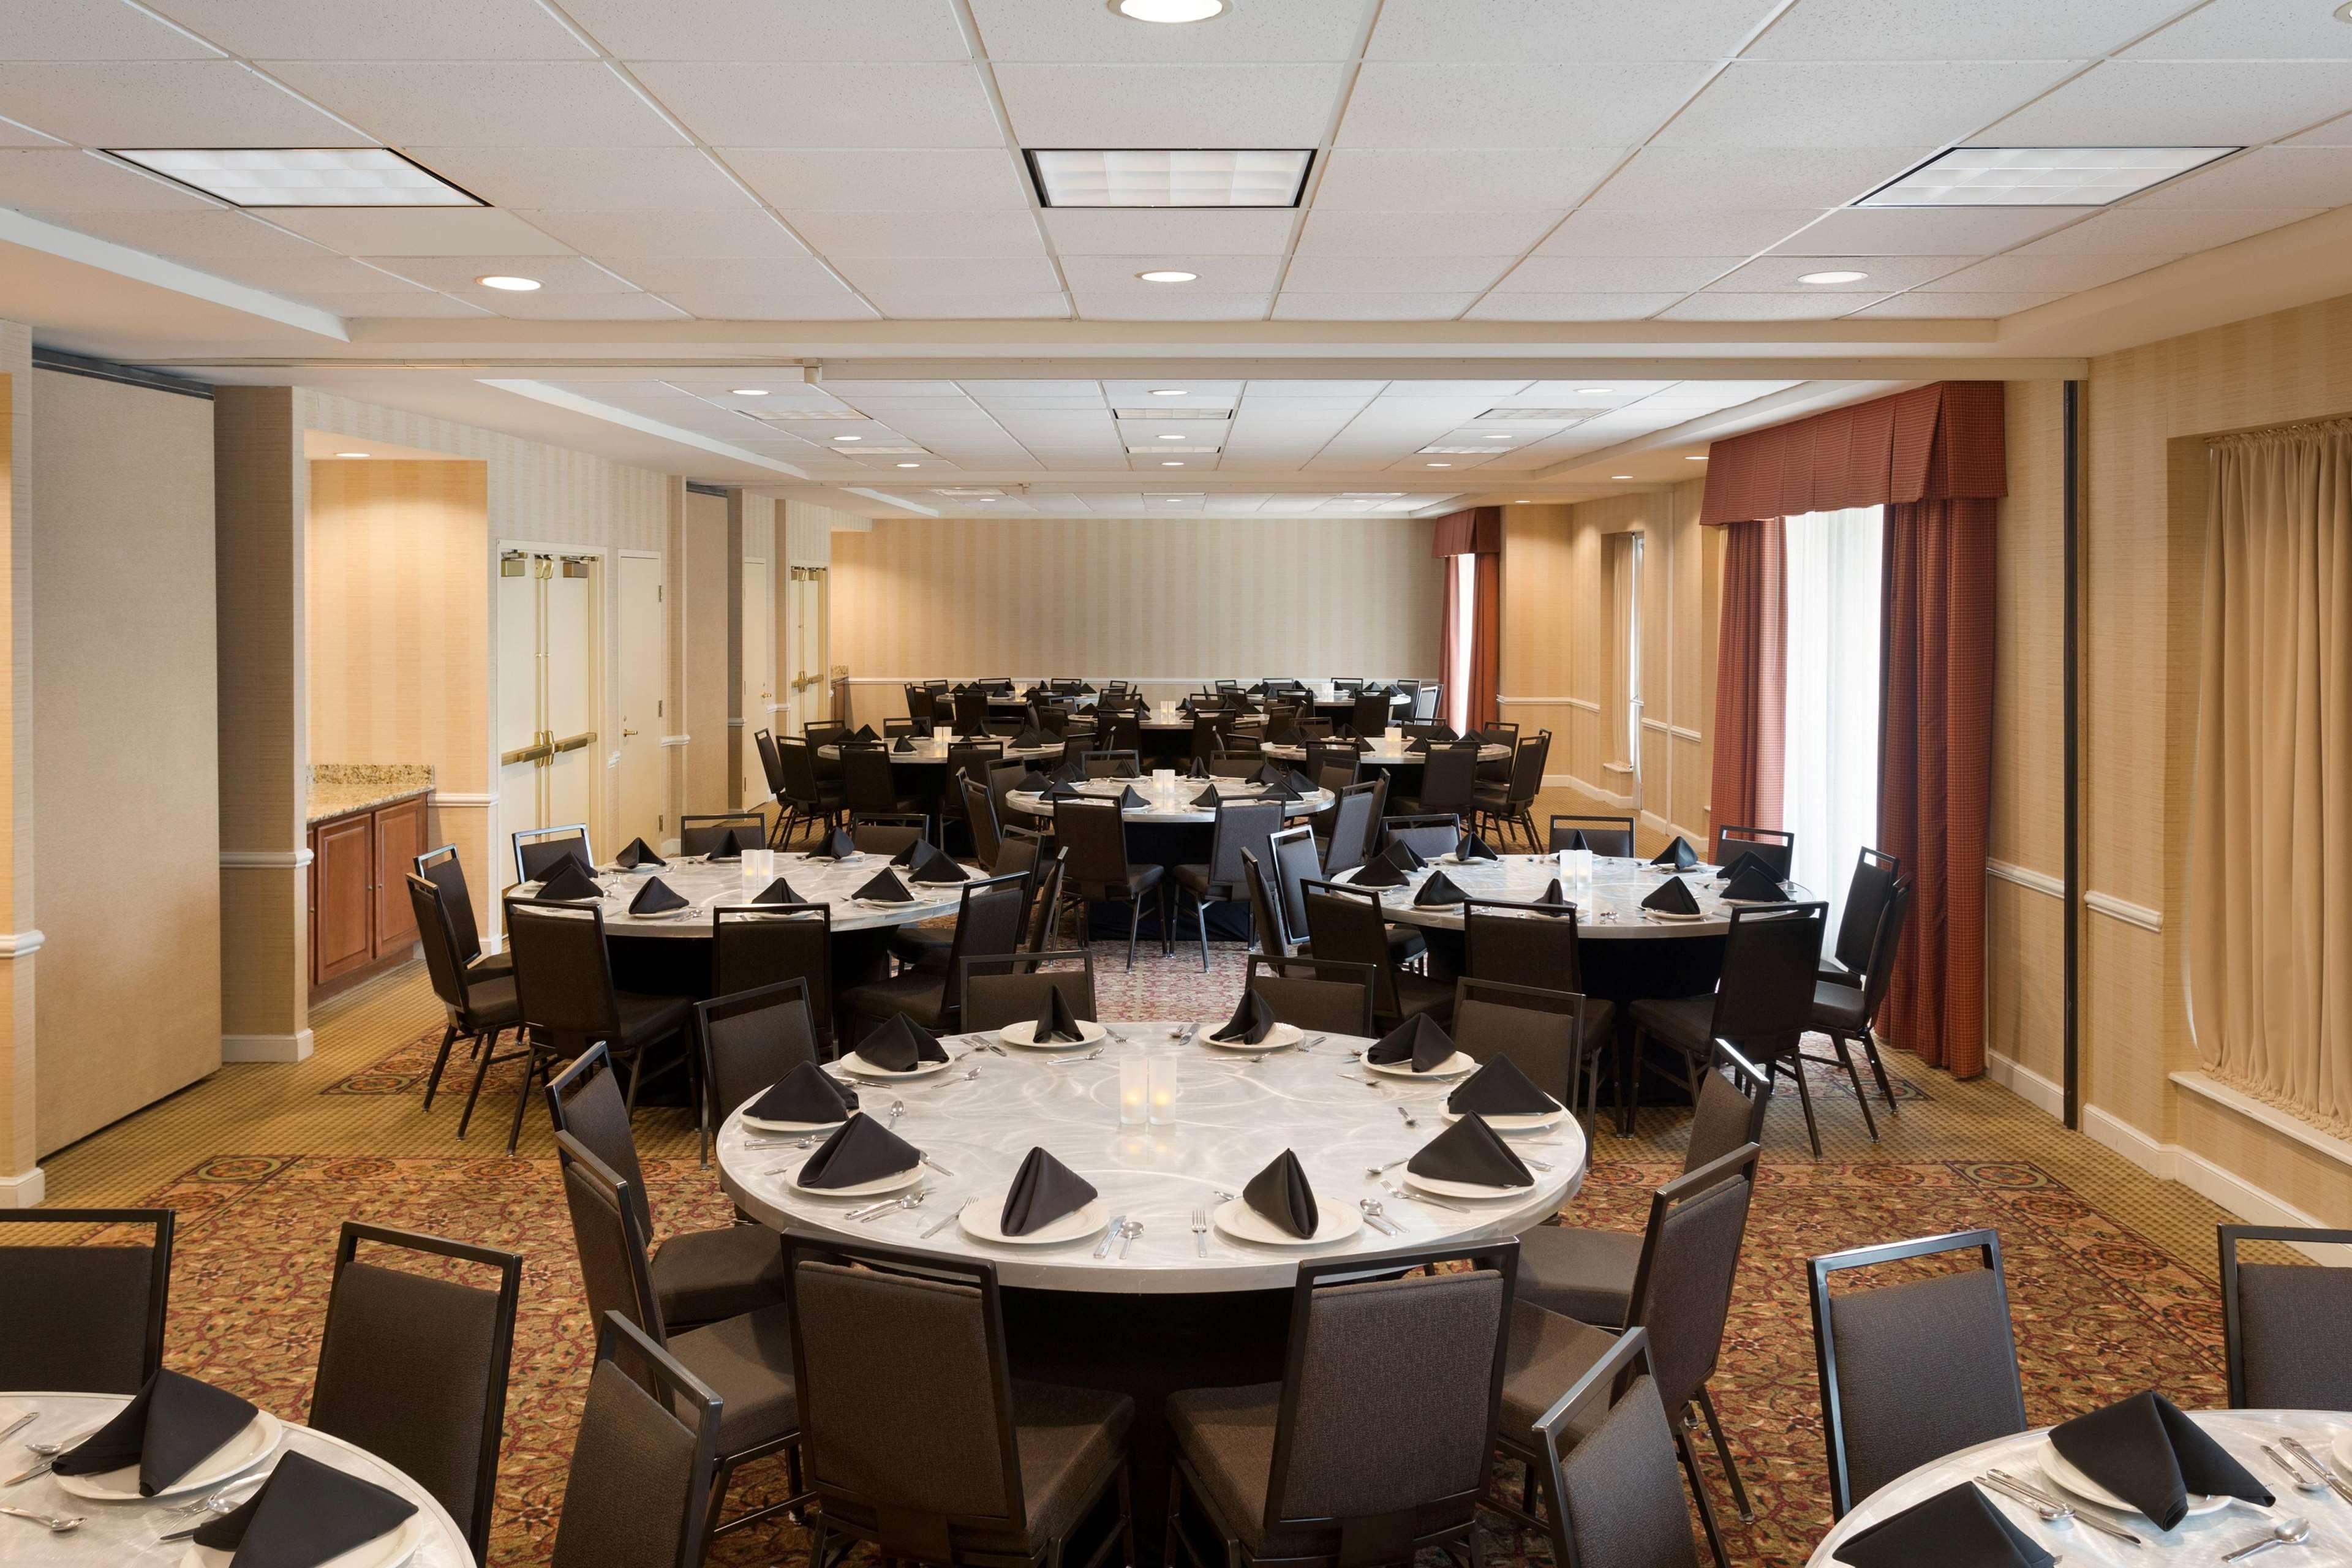 Hilton Garden Inn Chicago/Oakbrook Terrace image 13